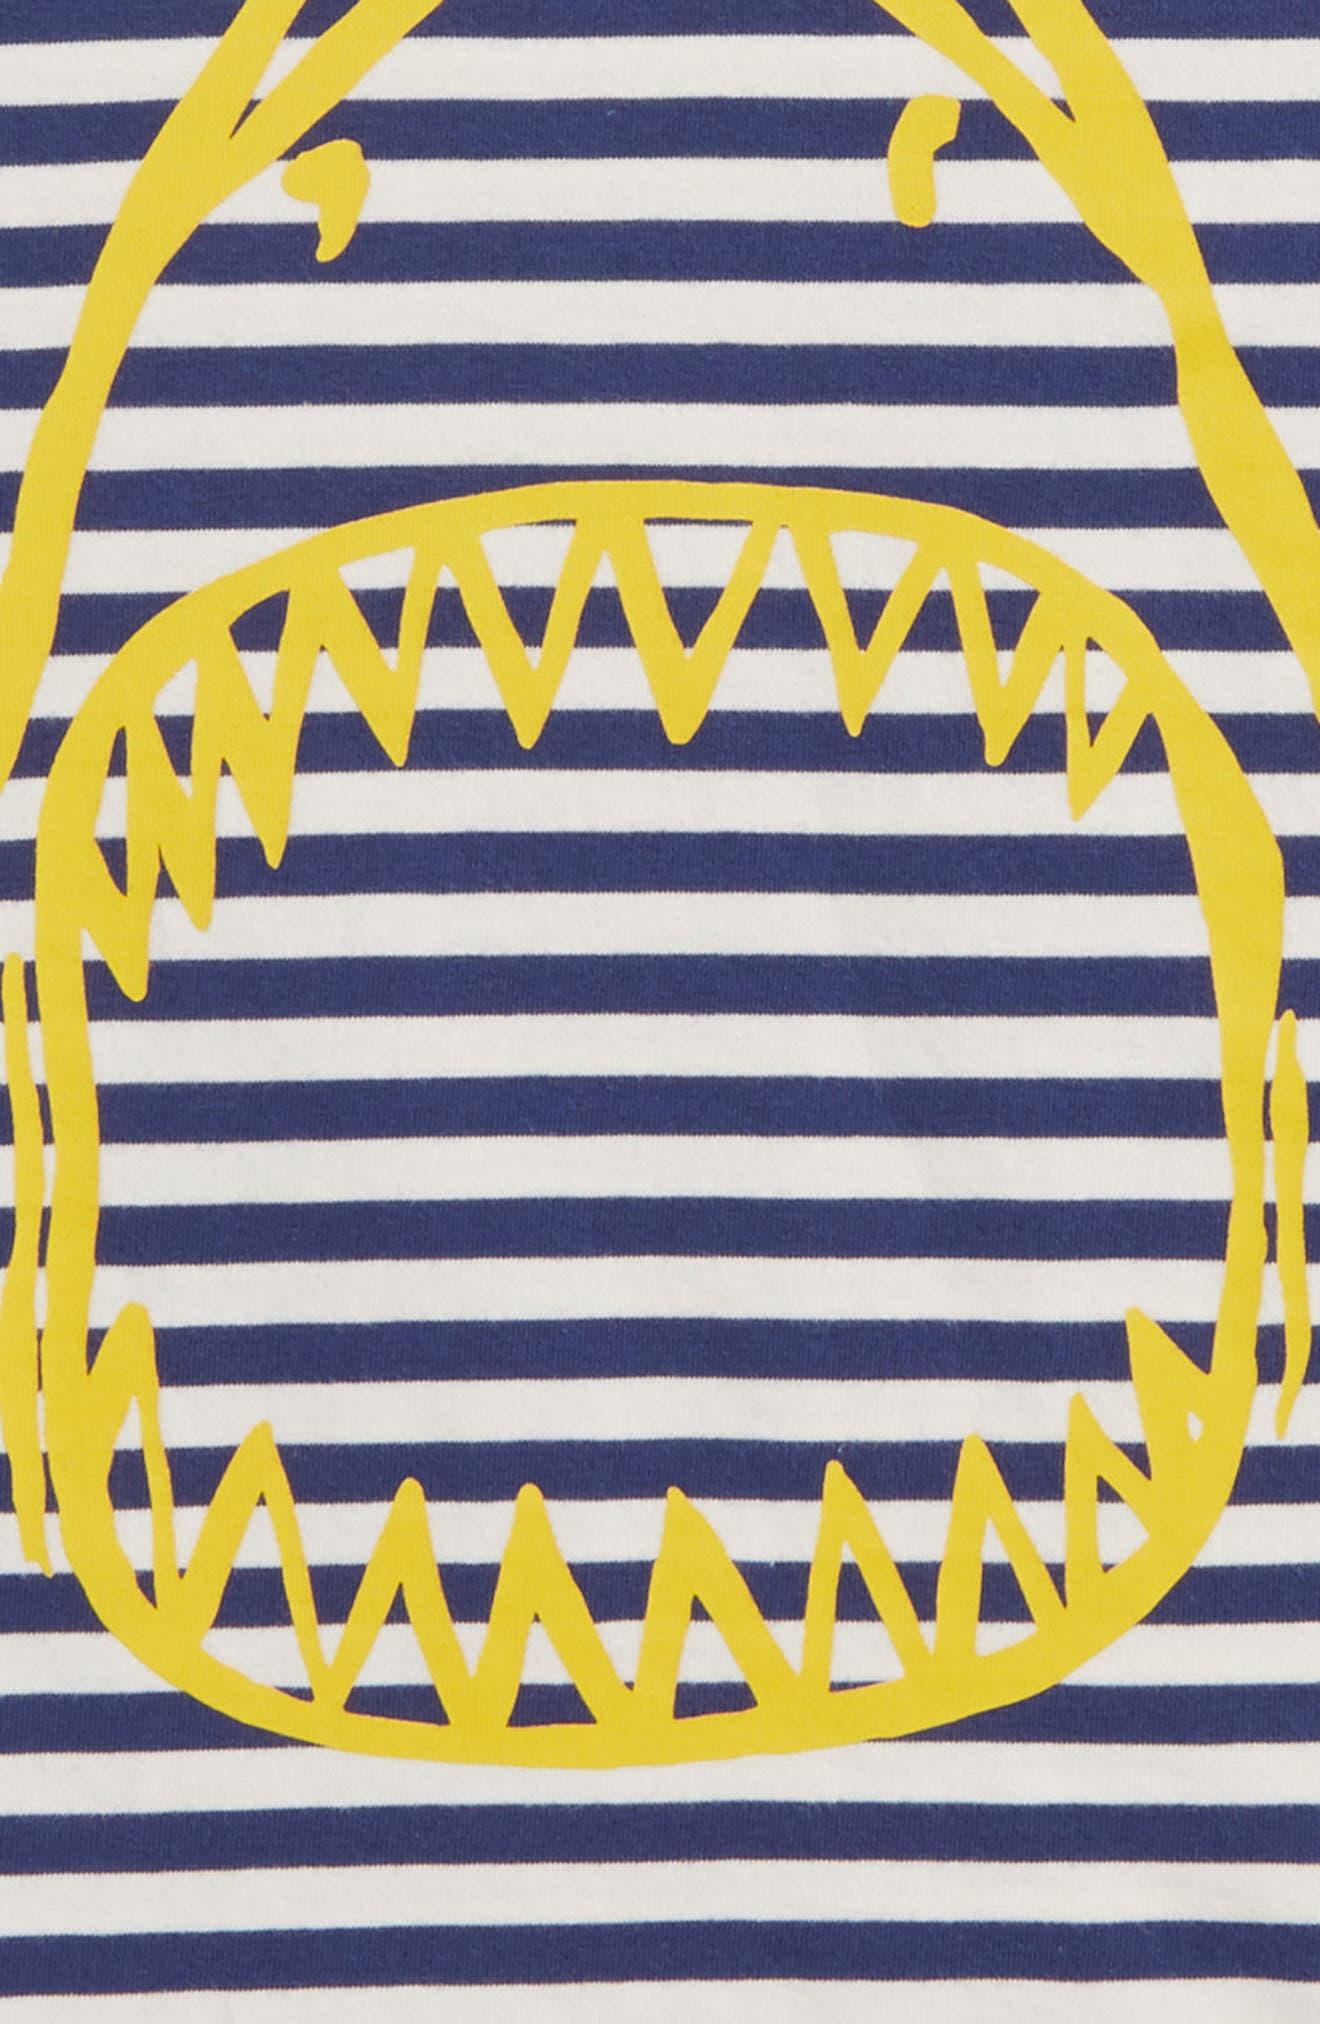 Arty Shark T-Shirt,                             Alternate thumbnail 2, color,                             Beacon Blue/ Ecru Shark